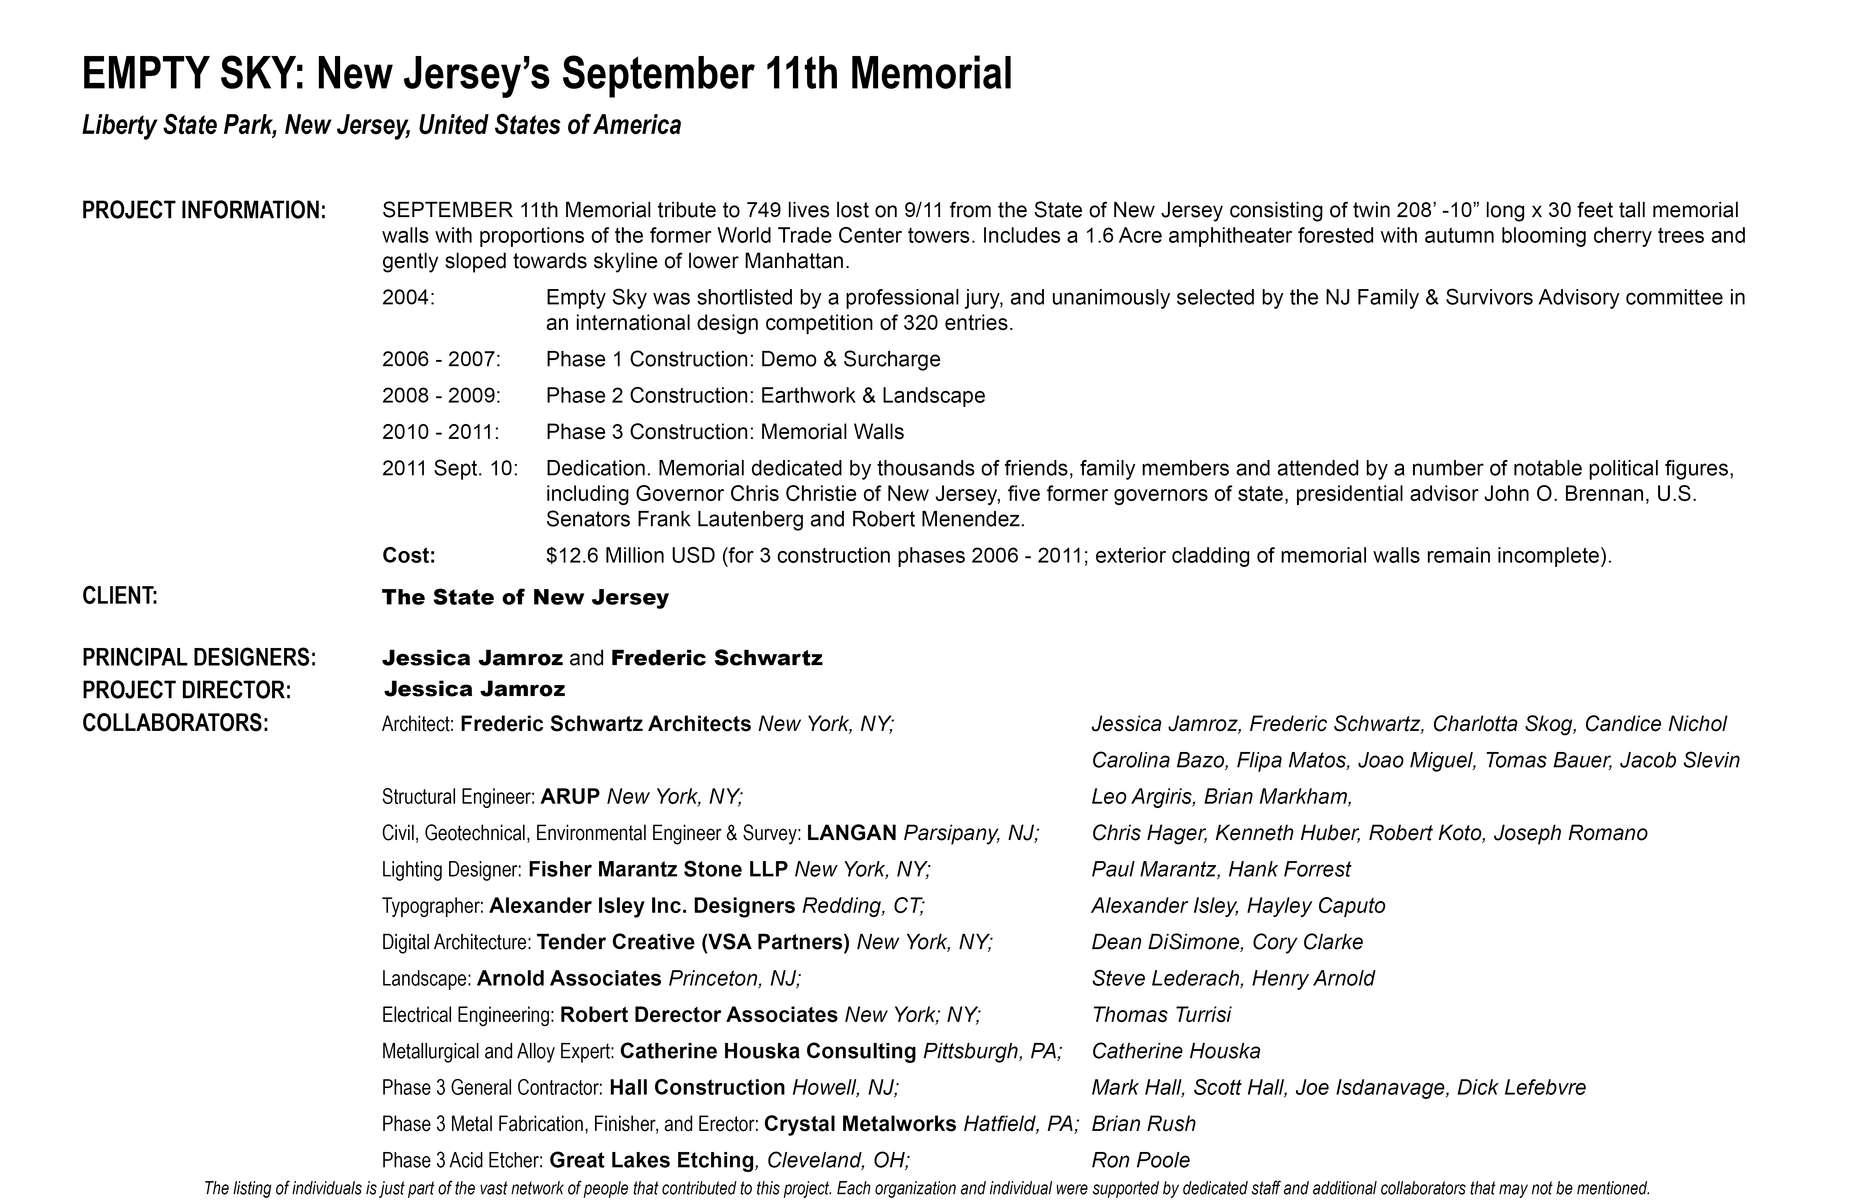 Project-Credits-NJ-9-11